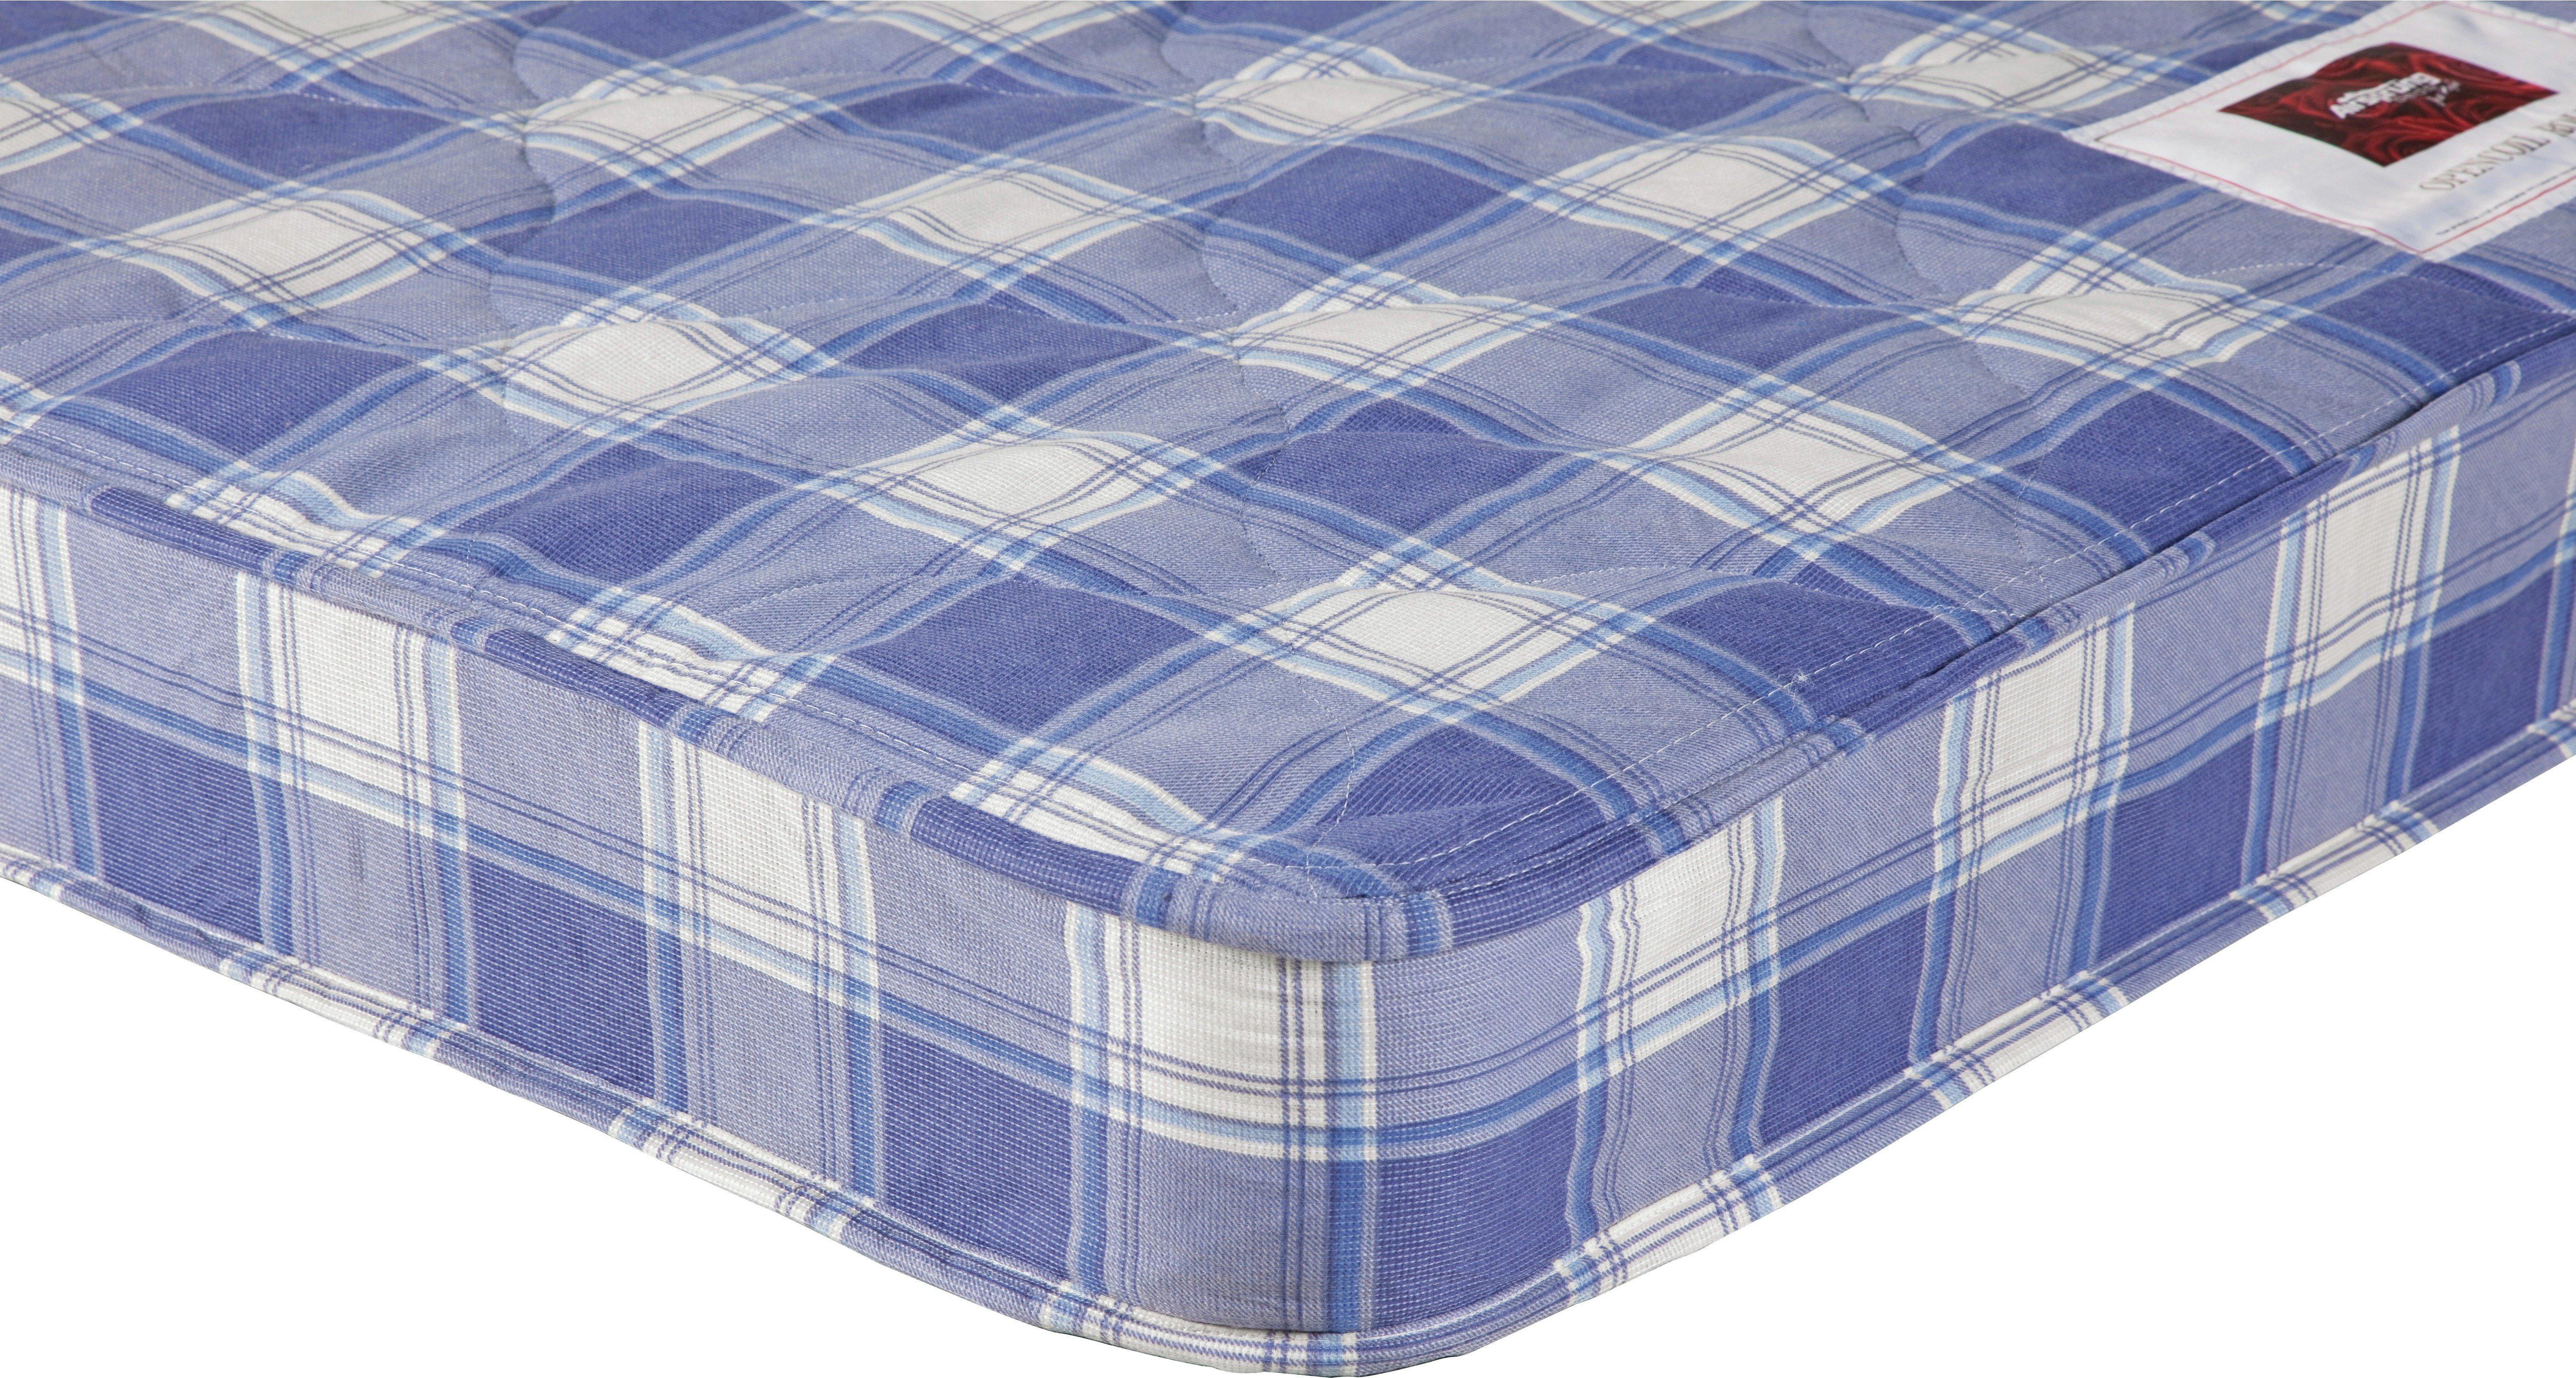 buy airsprung stitchbond sprung rolled single mattress at argoscouk your online shop for mattresses bedroom furniture home and garden - Mattress